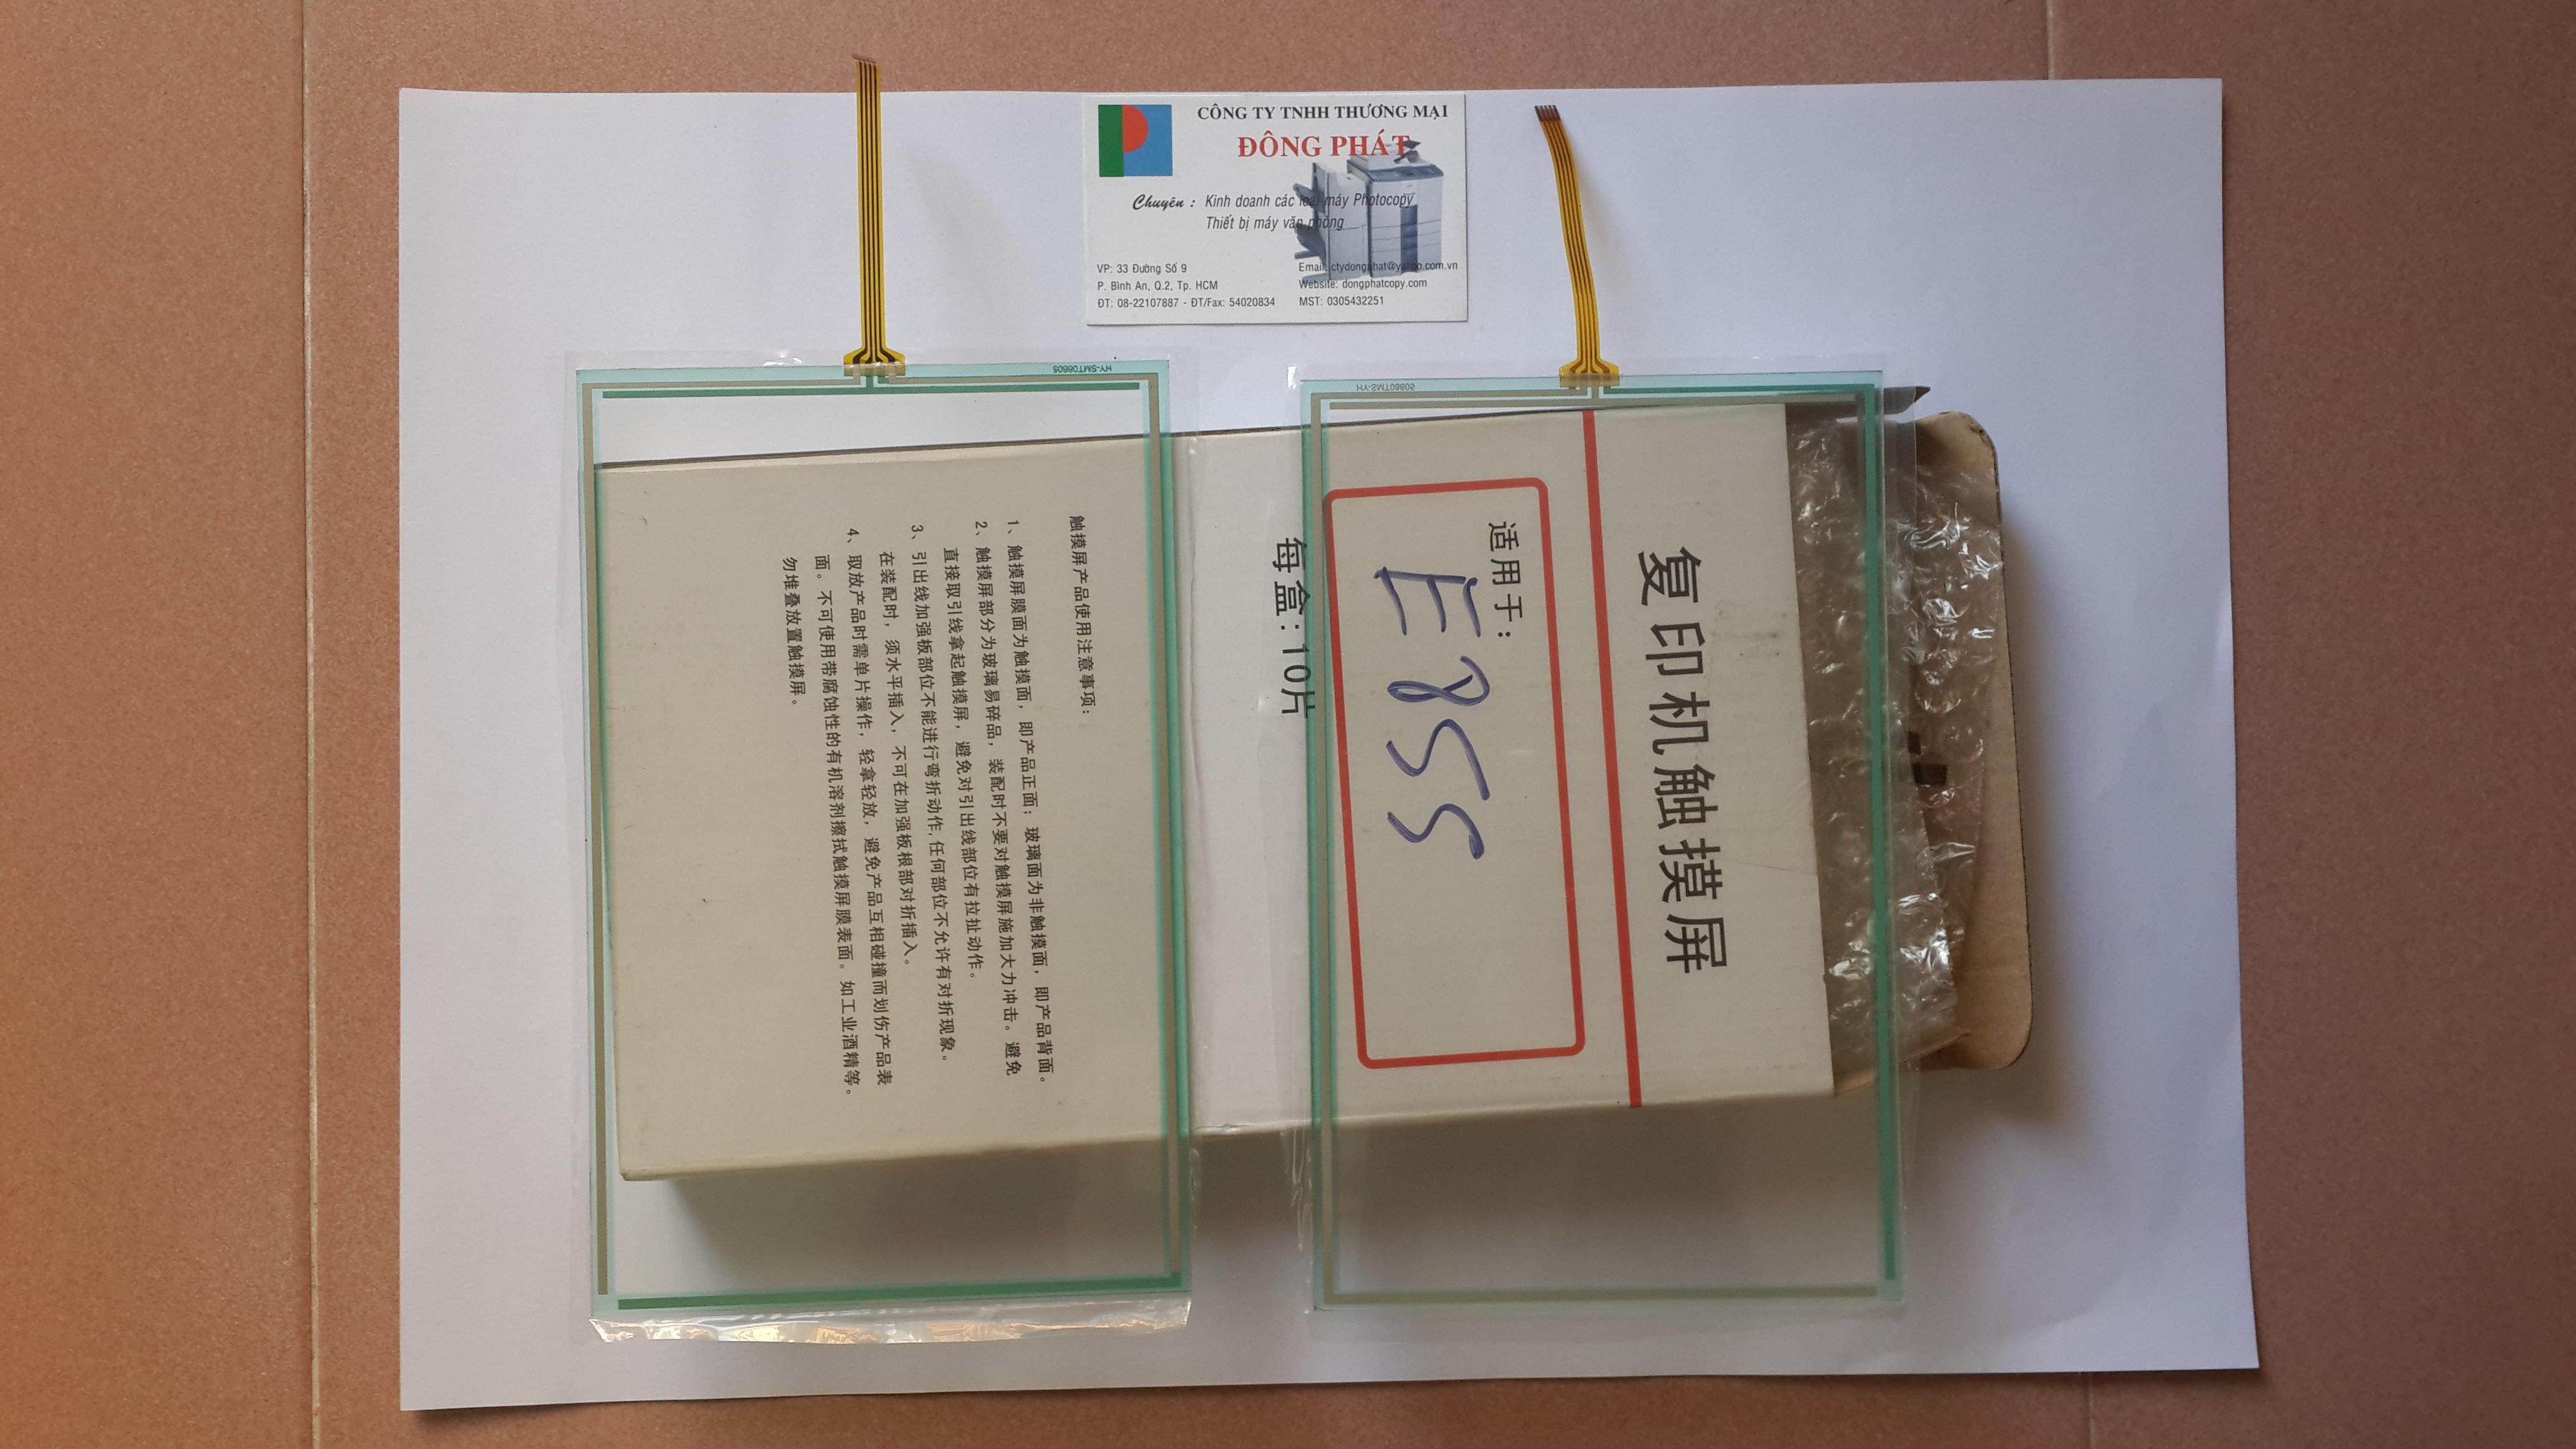 Mặt cảm ứng cho máy photocopy Toshiba Estudio 655-855-656-856